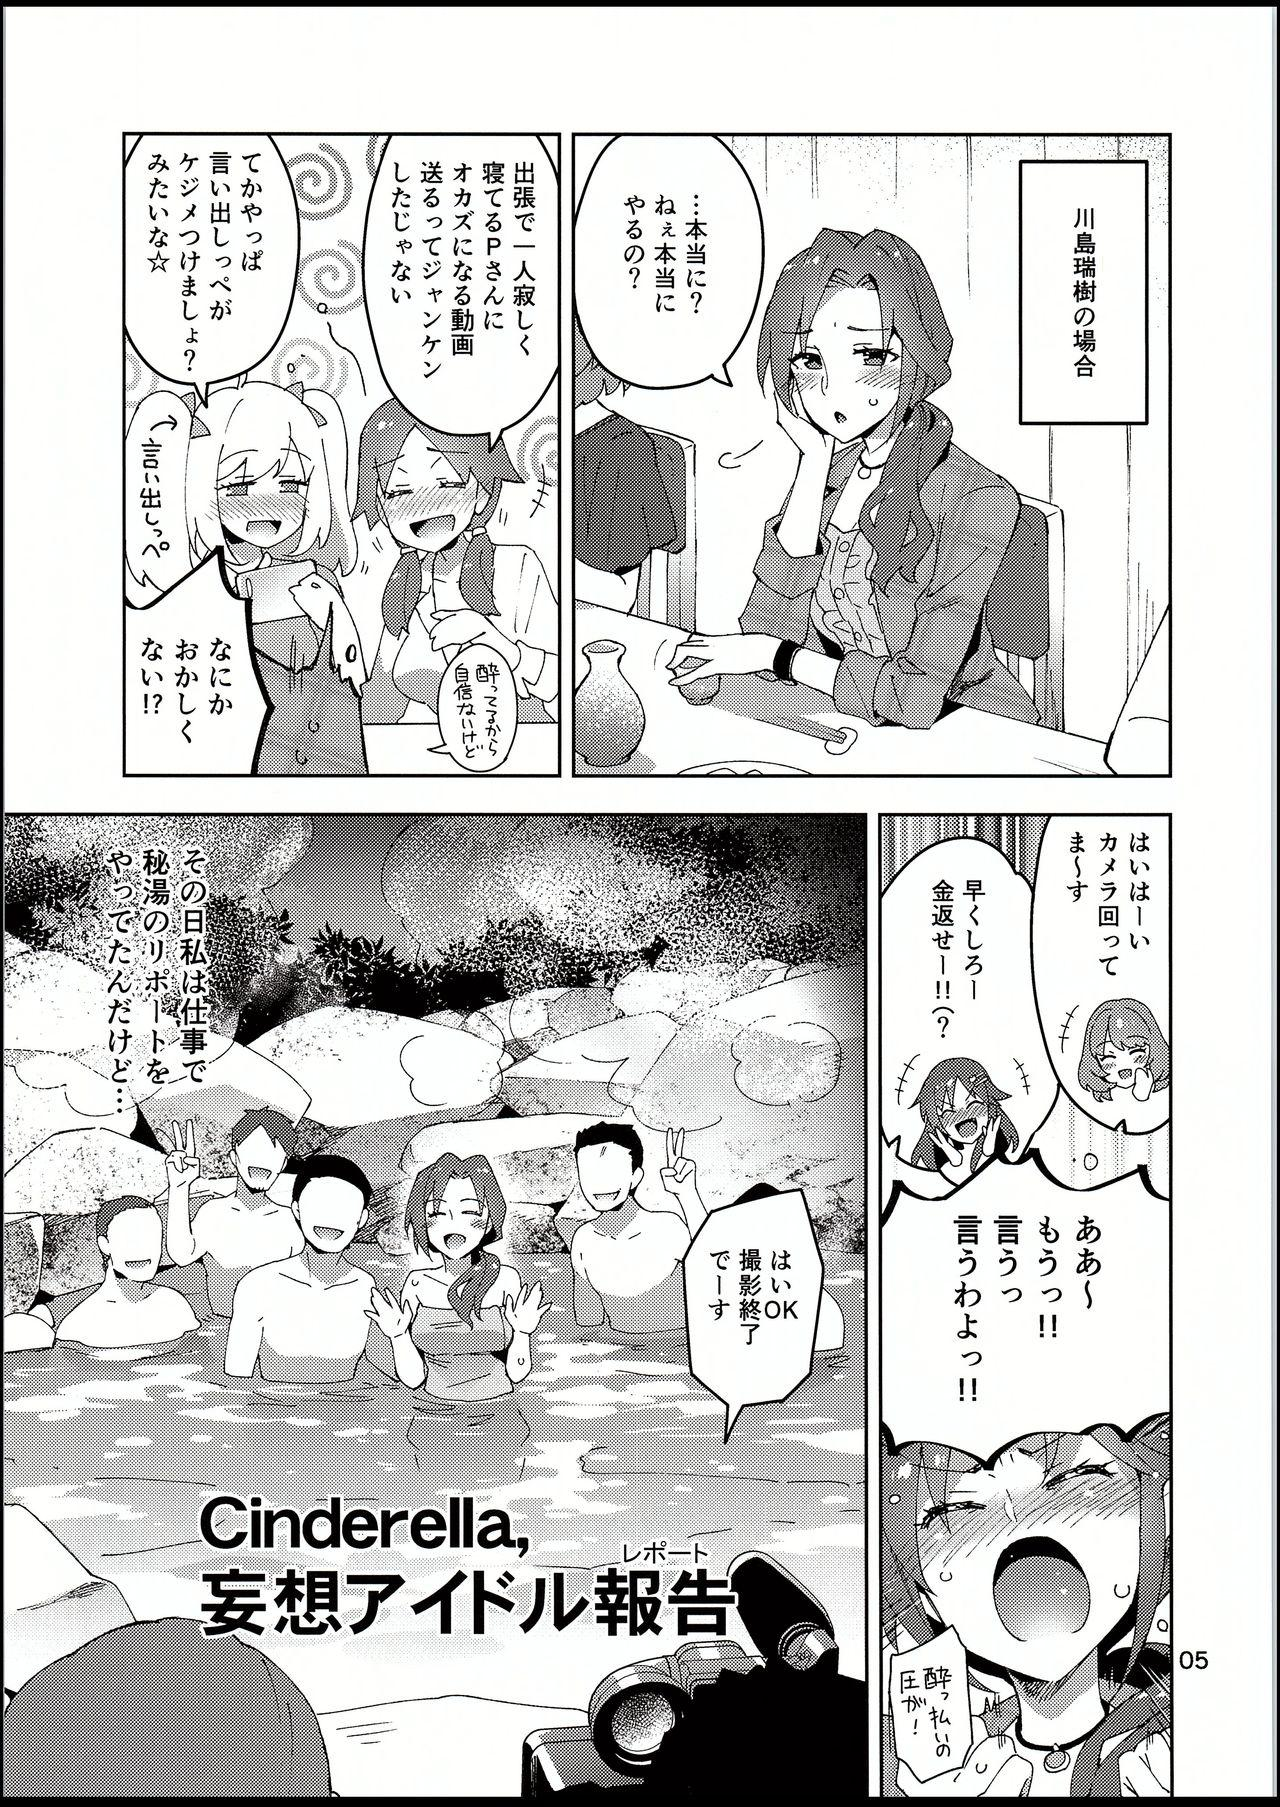 Cinderella, Mousou IDOL Report Junbigou 3